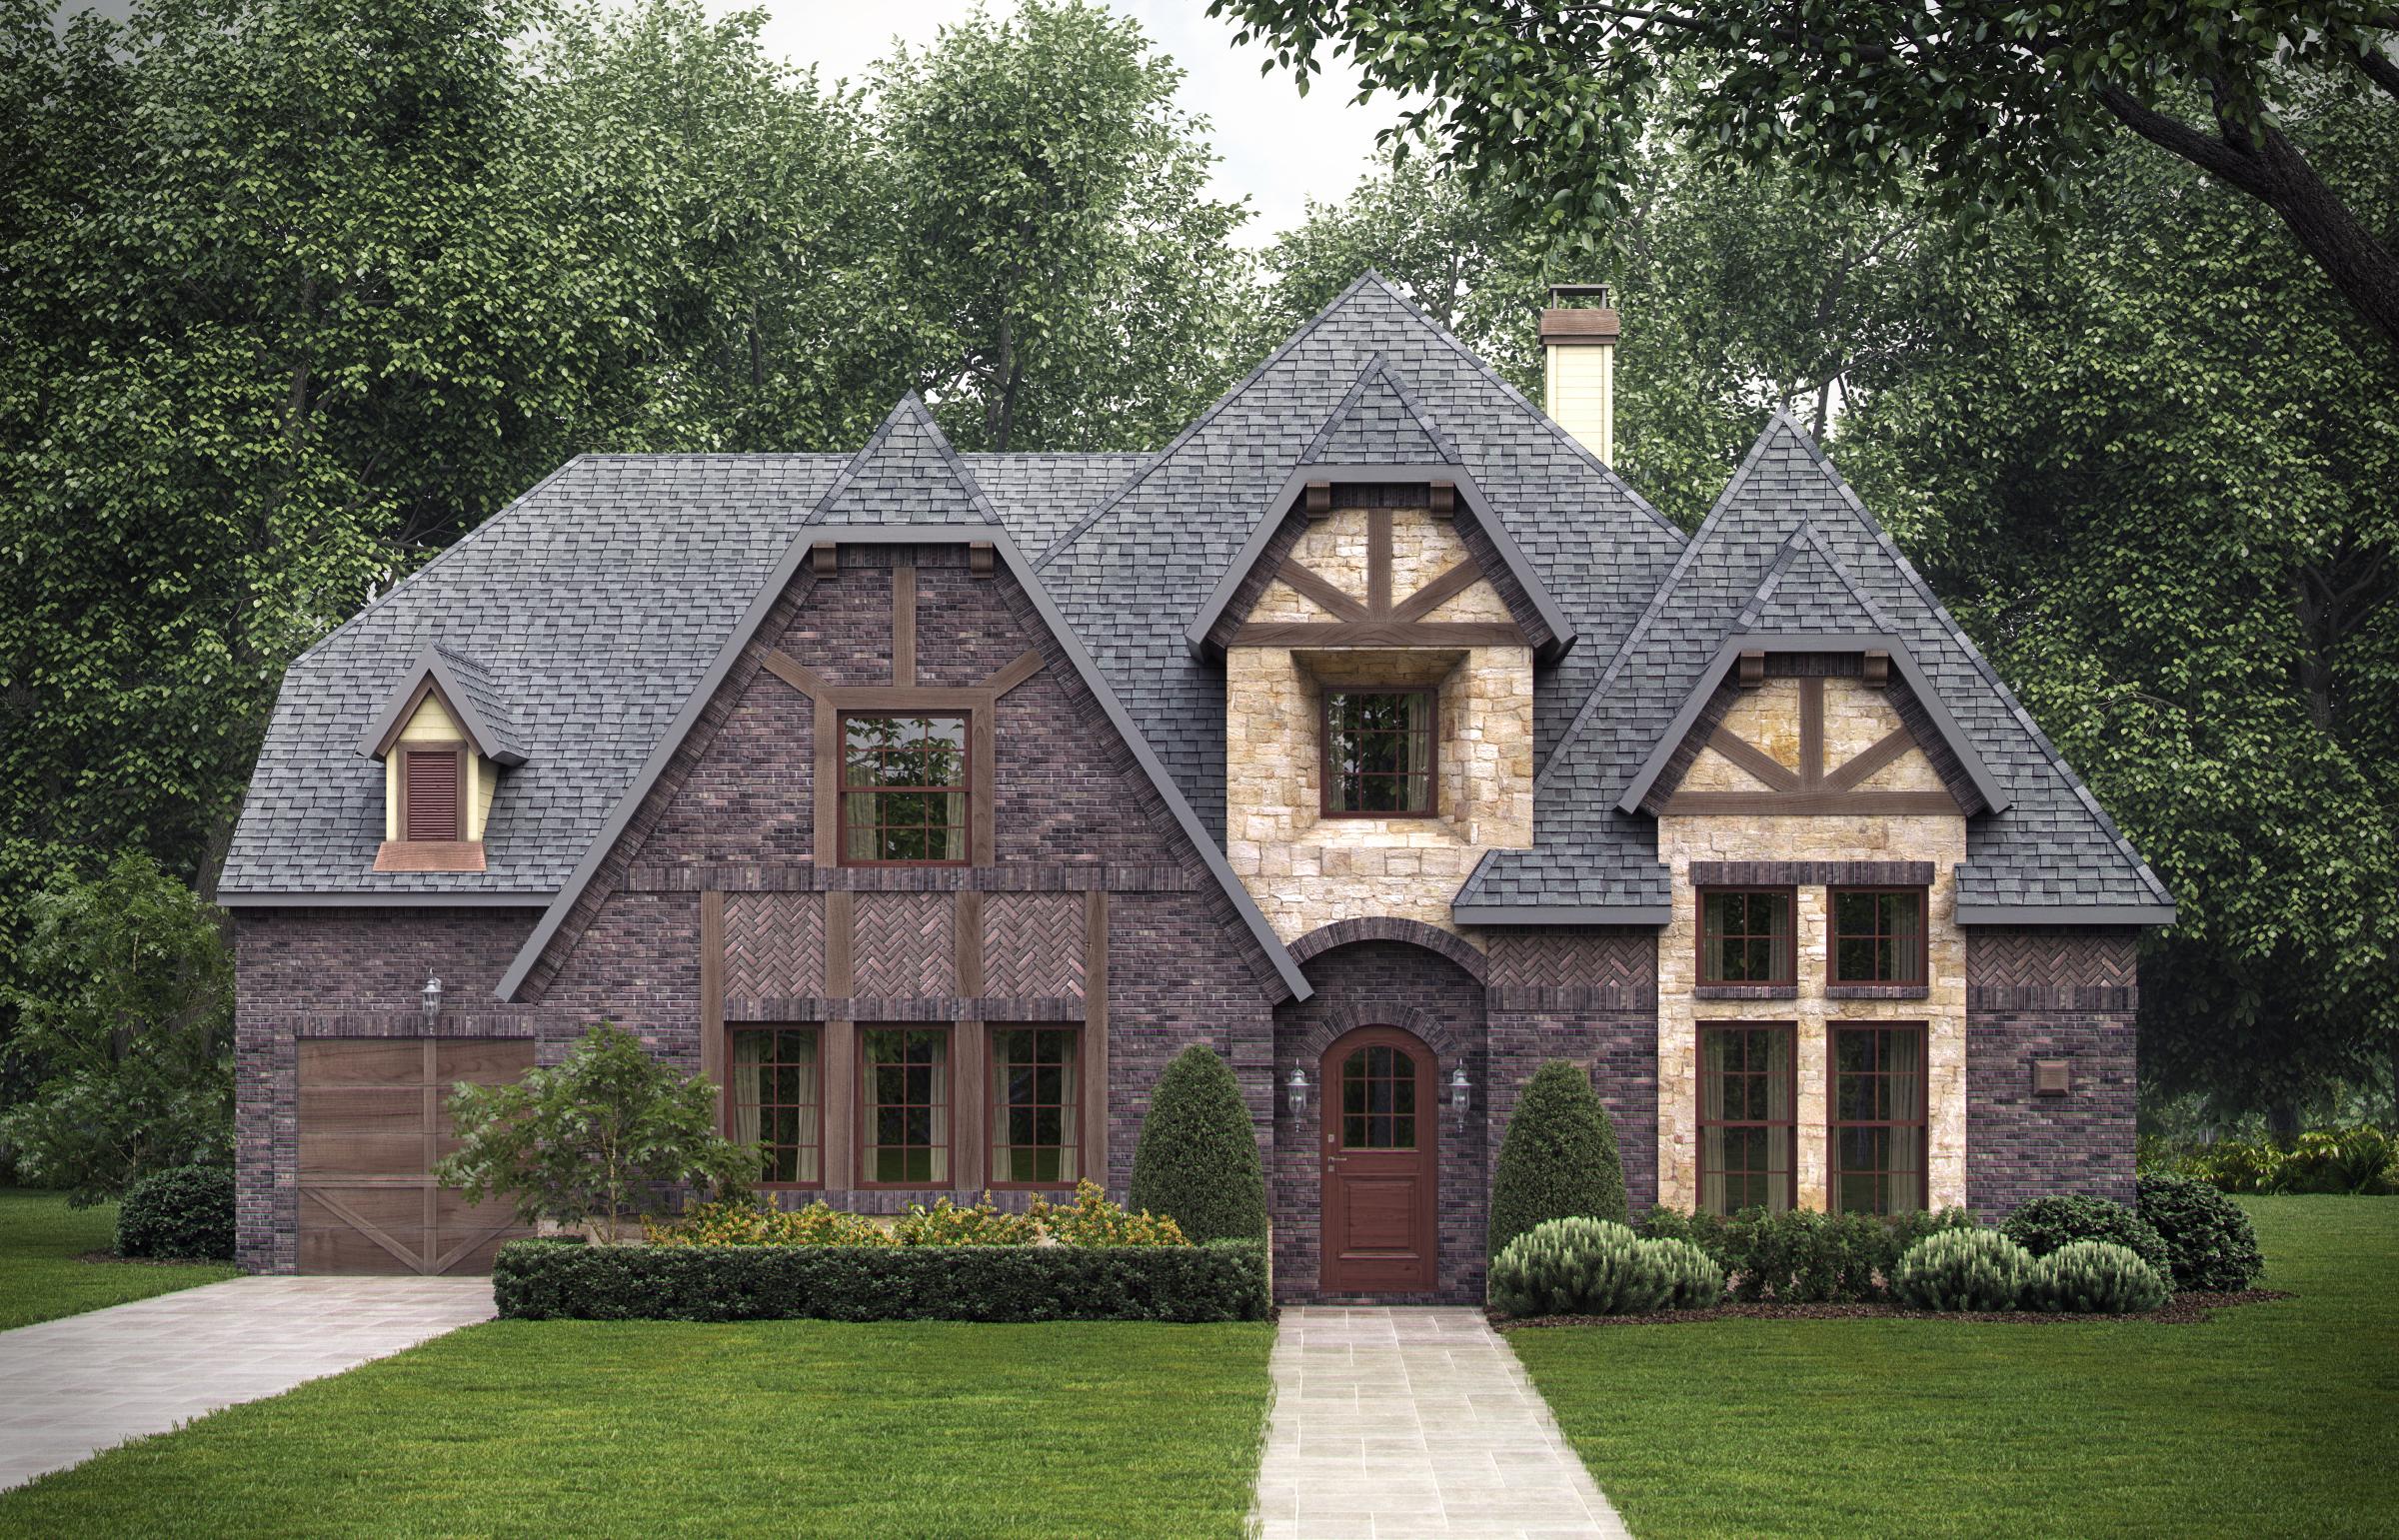 4 Bedrm 4268 Sq Ft Tudor House Plan 195 1025